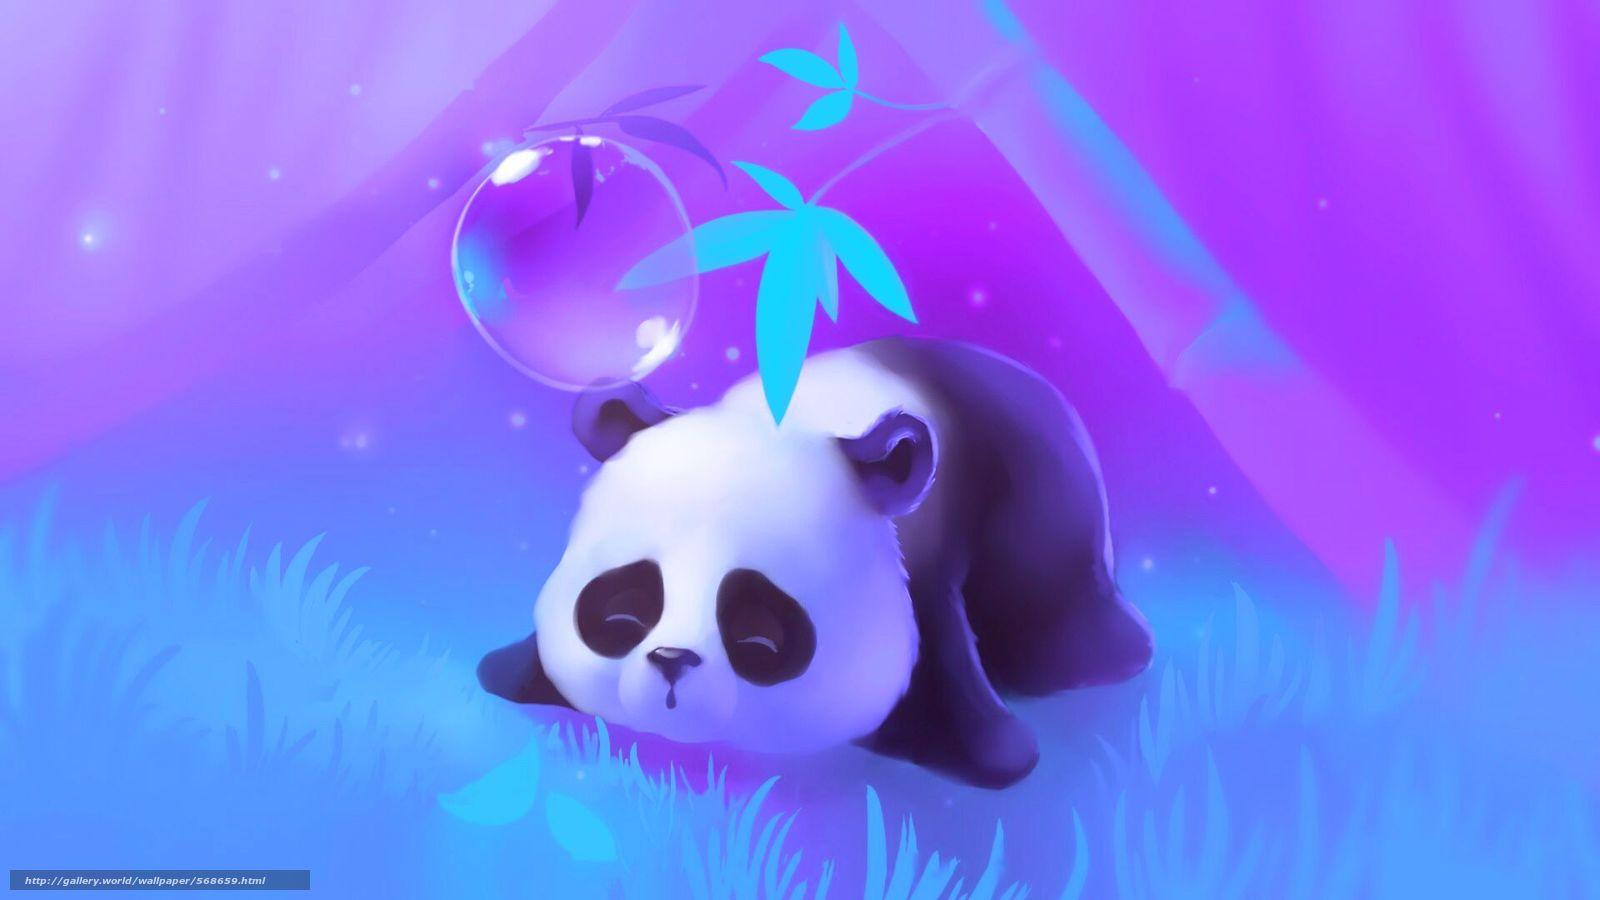 descargar gratis árbol panda duerme hierba fondos de escritorio